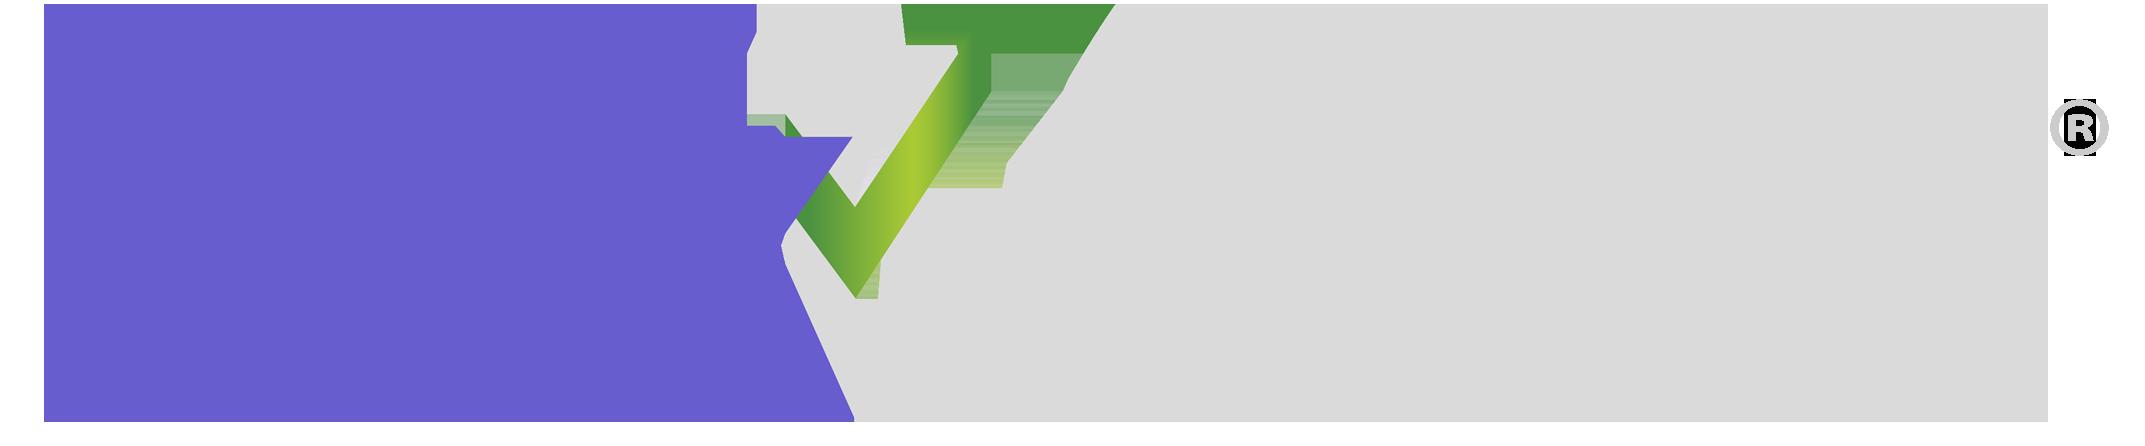 RiskKarma™,